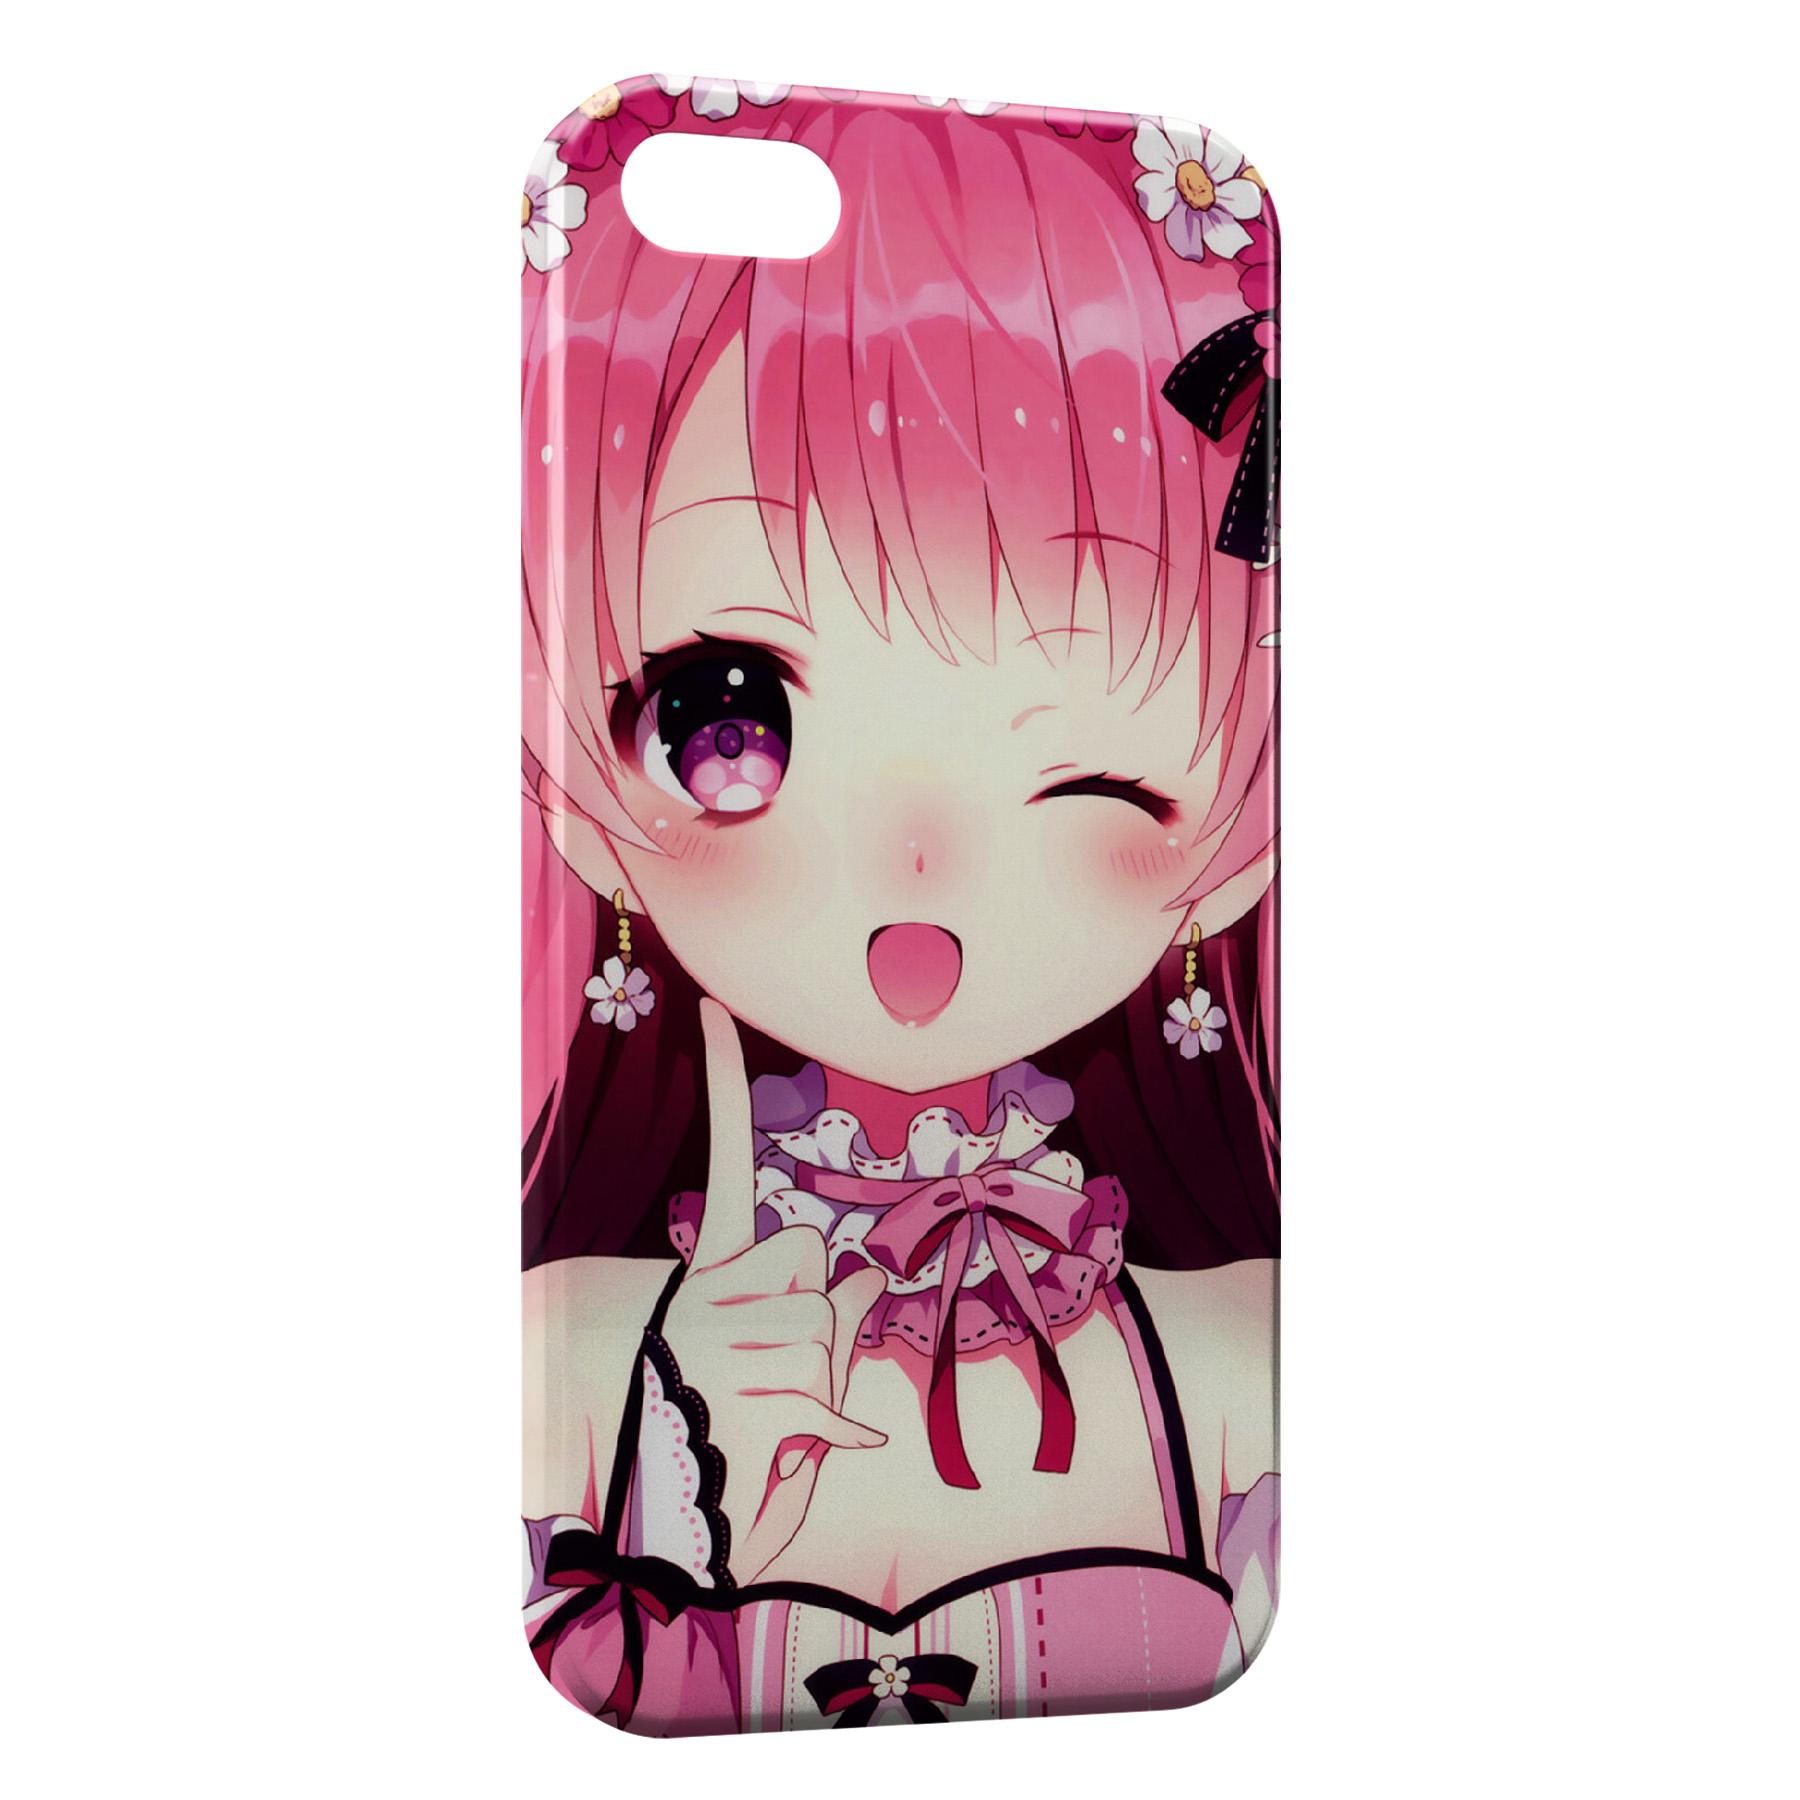 Coque iPhone 6 6S Cute Girl Manga